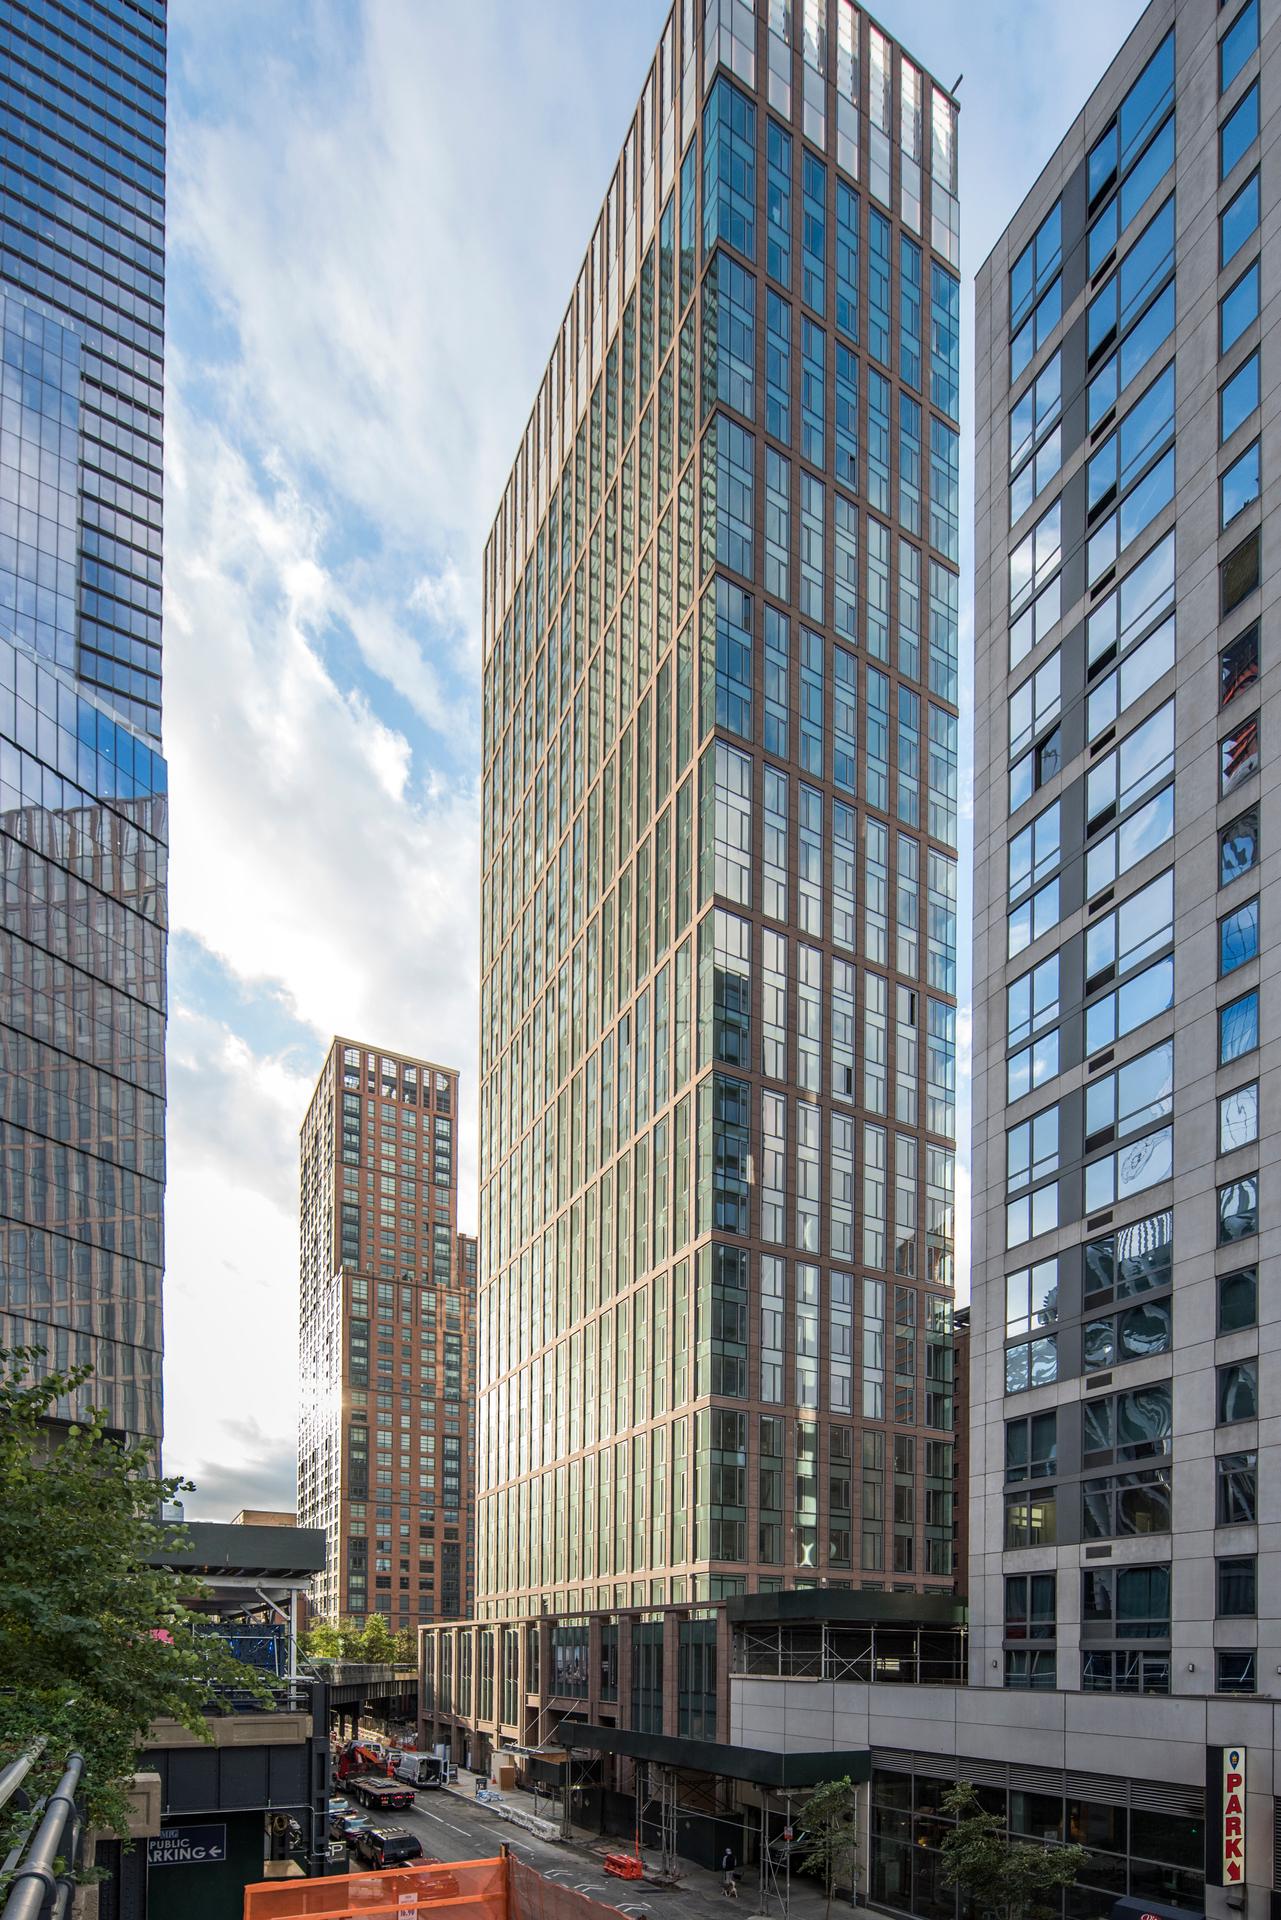 The modern exterior design of One Hudson Yards in Manhattan in New York City.